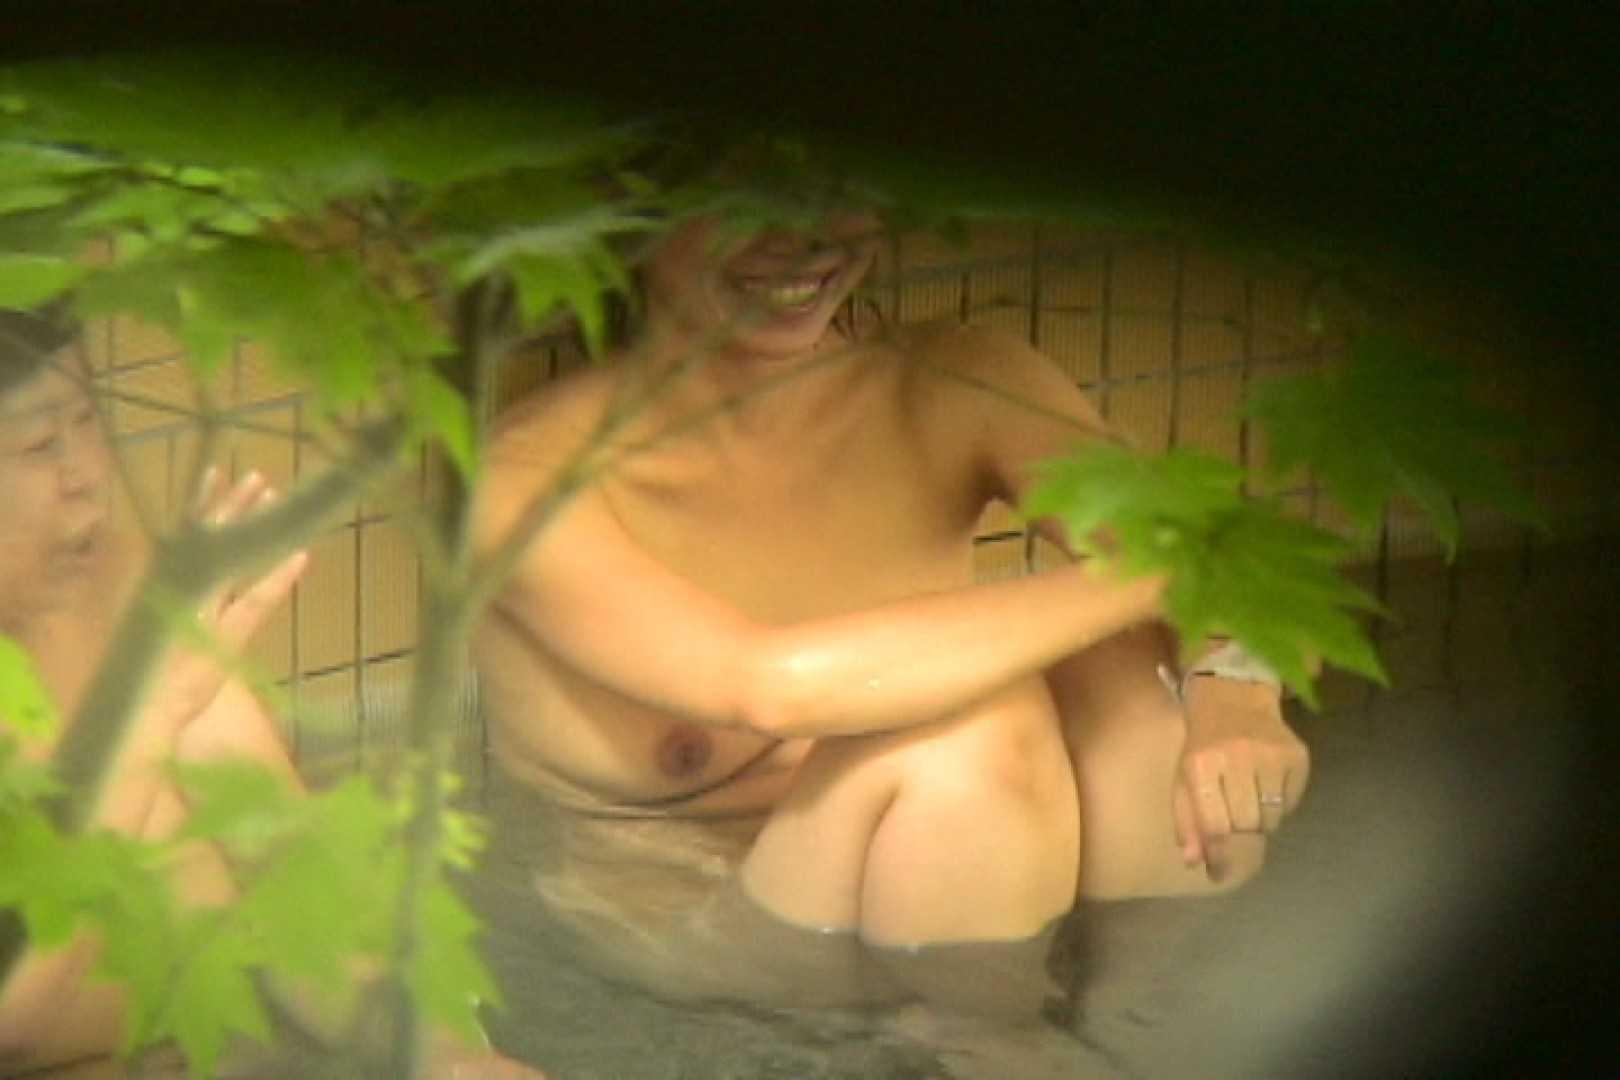 Aquaな露天風呂Vol.703 盗撮師作品  93pic 78